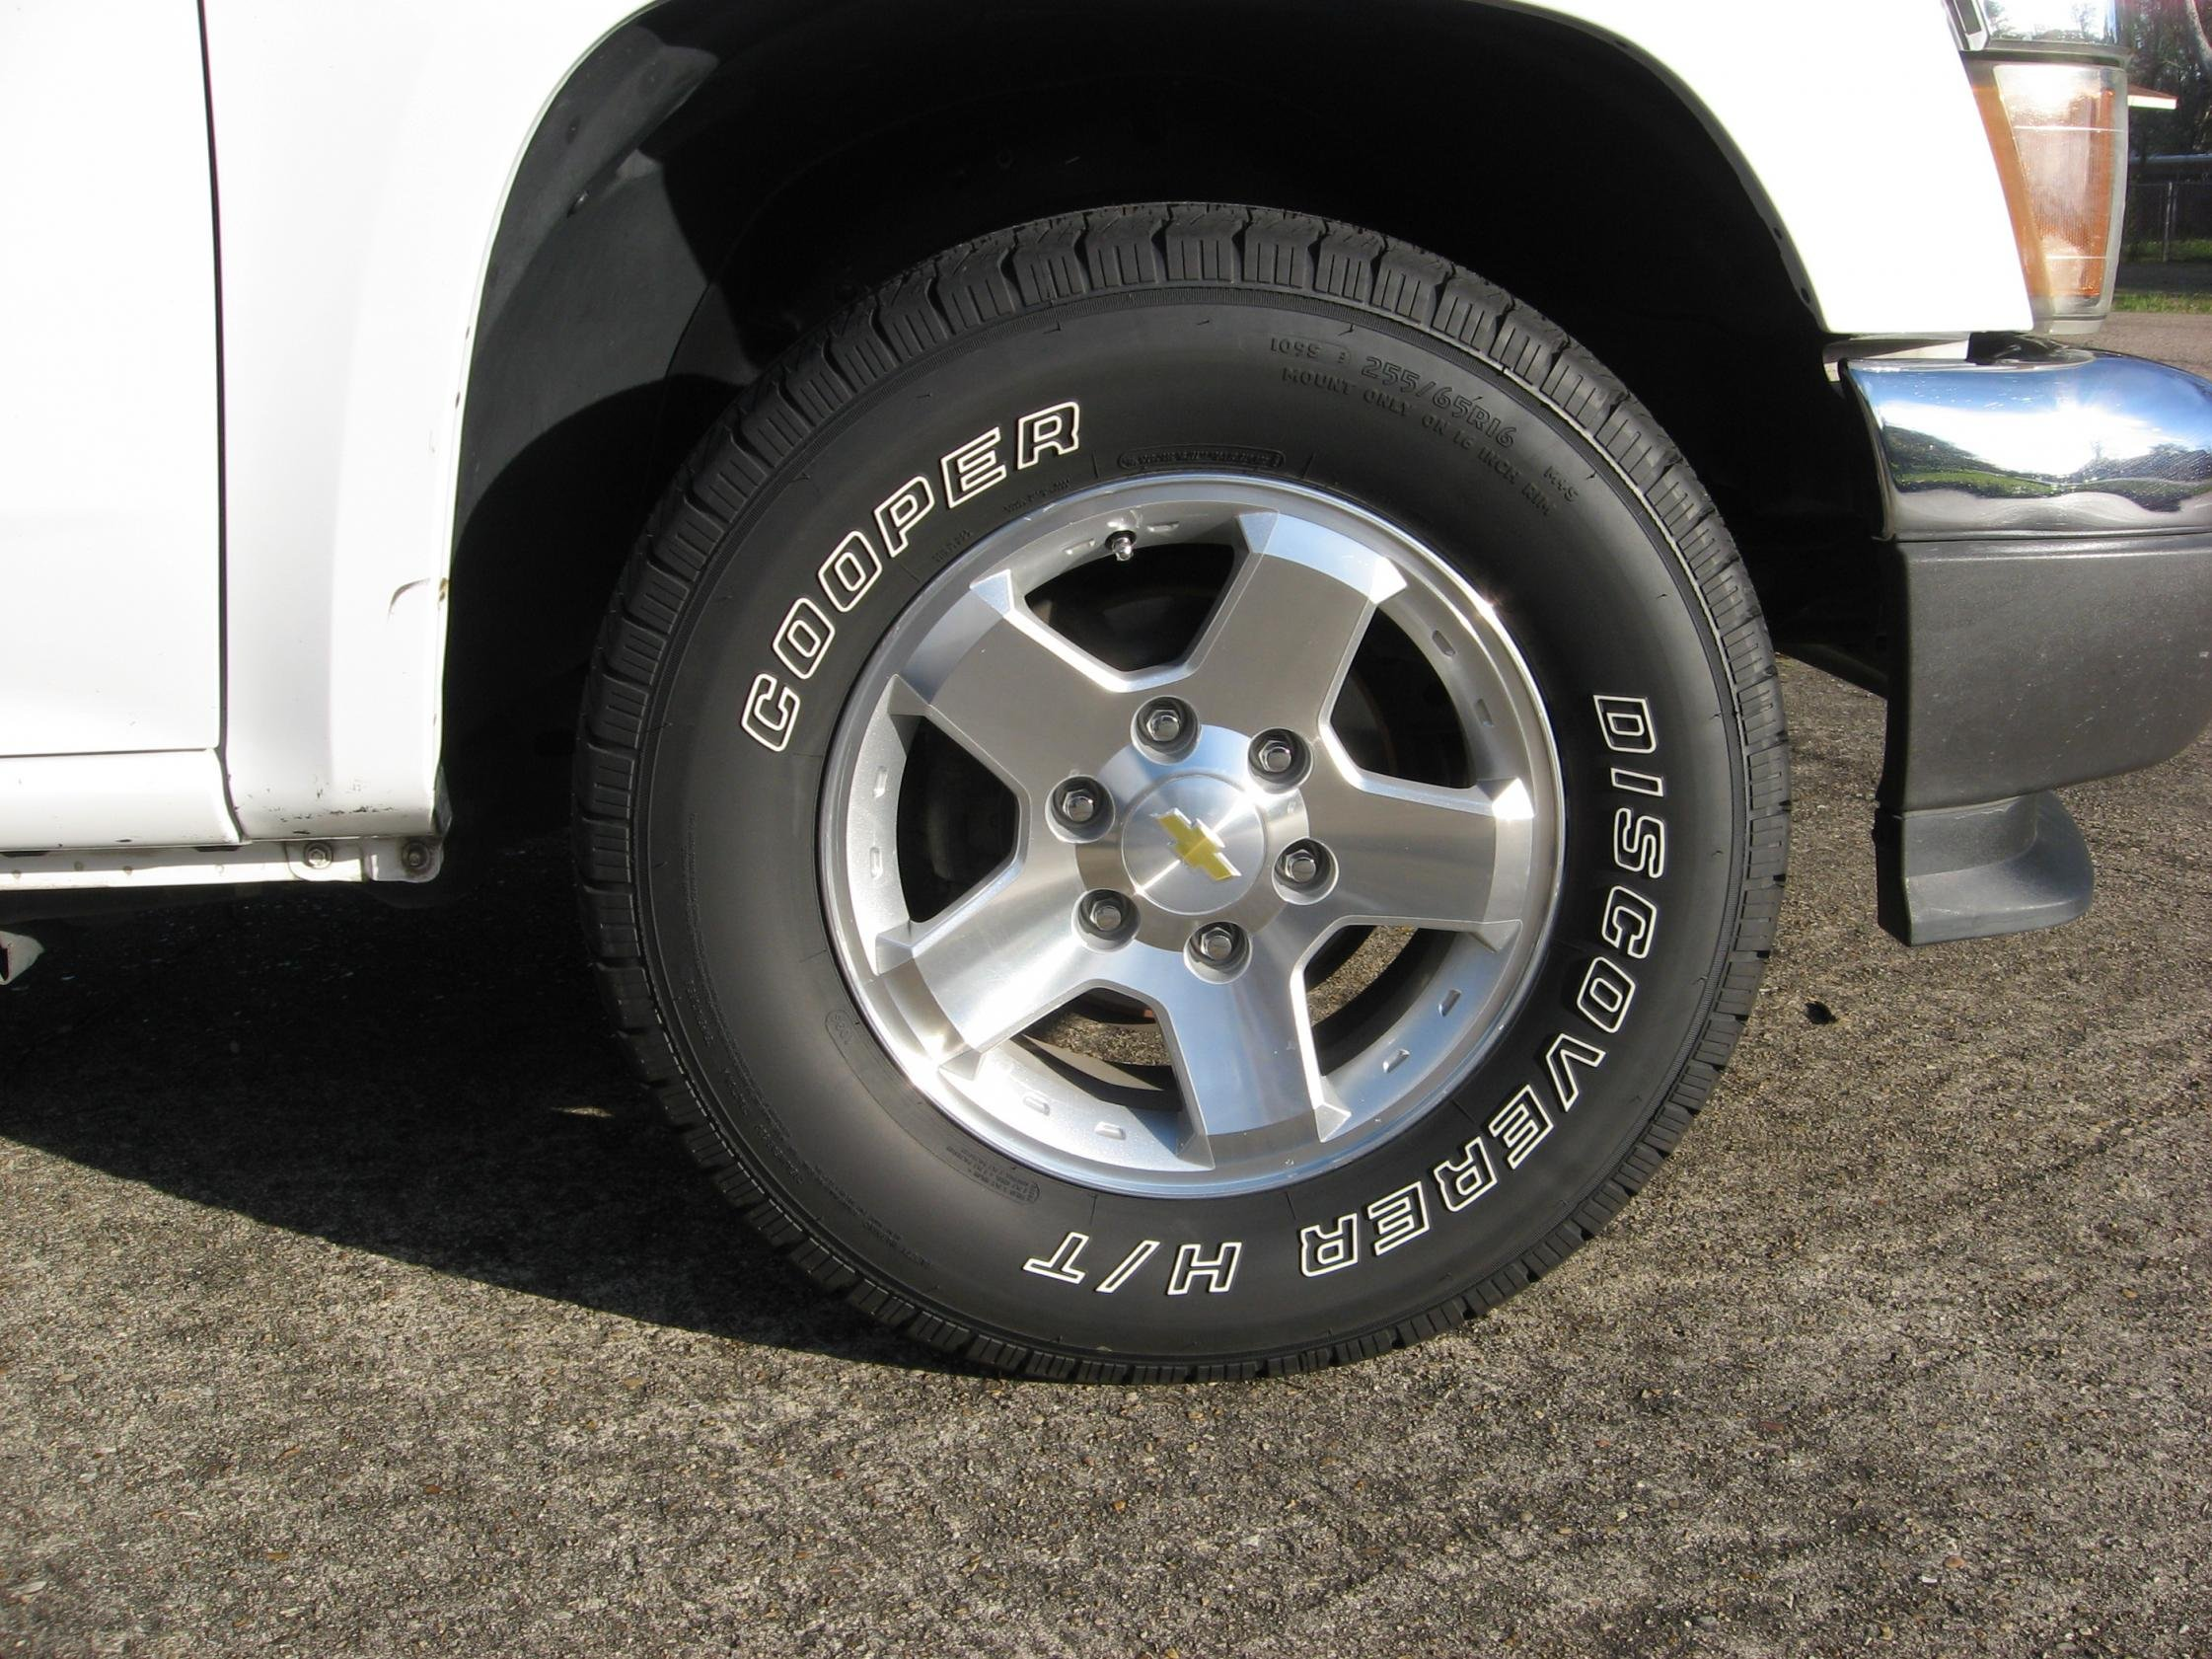 new tires again 255 65 16 chevrolet colorado gmc canyon forum. Black Bedroom Furniture Sets. Home Design Ideas